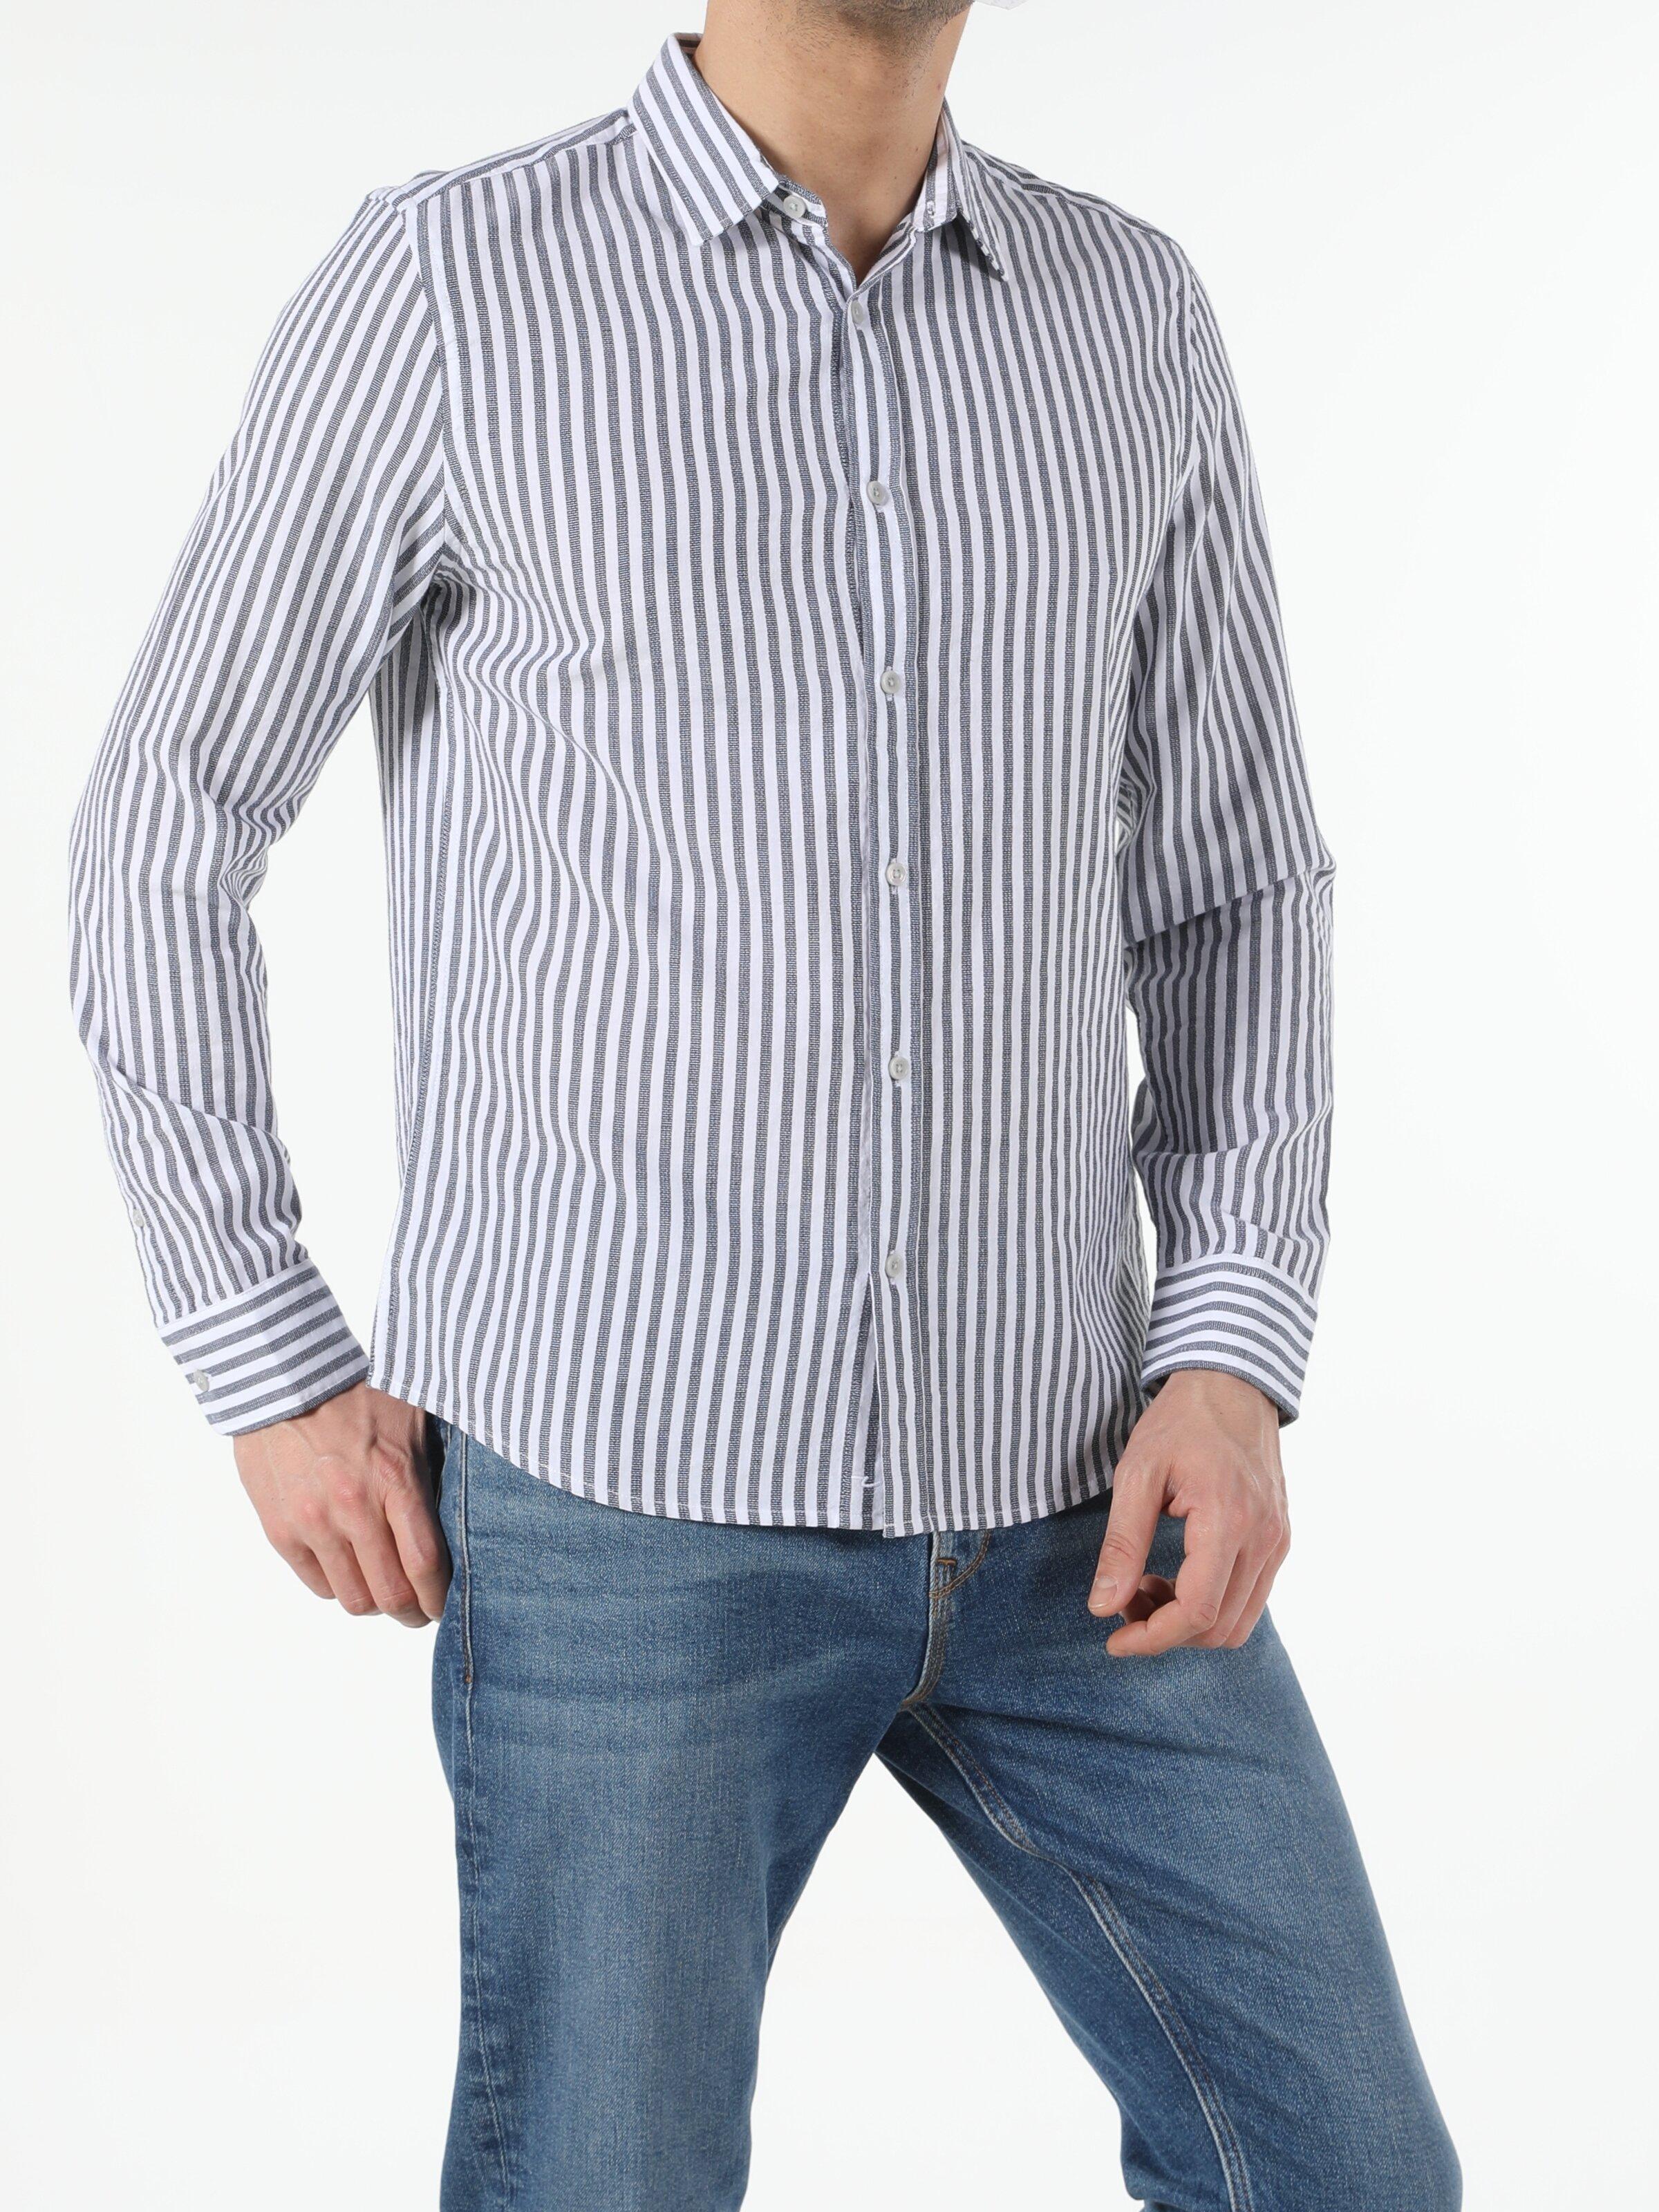 Antrasit Slim Fit Shirt Neck  Erkek Uzun Kol Gömlek